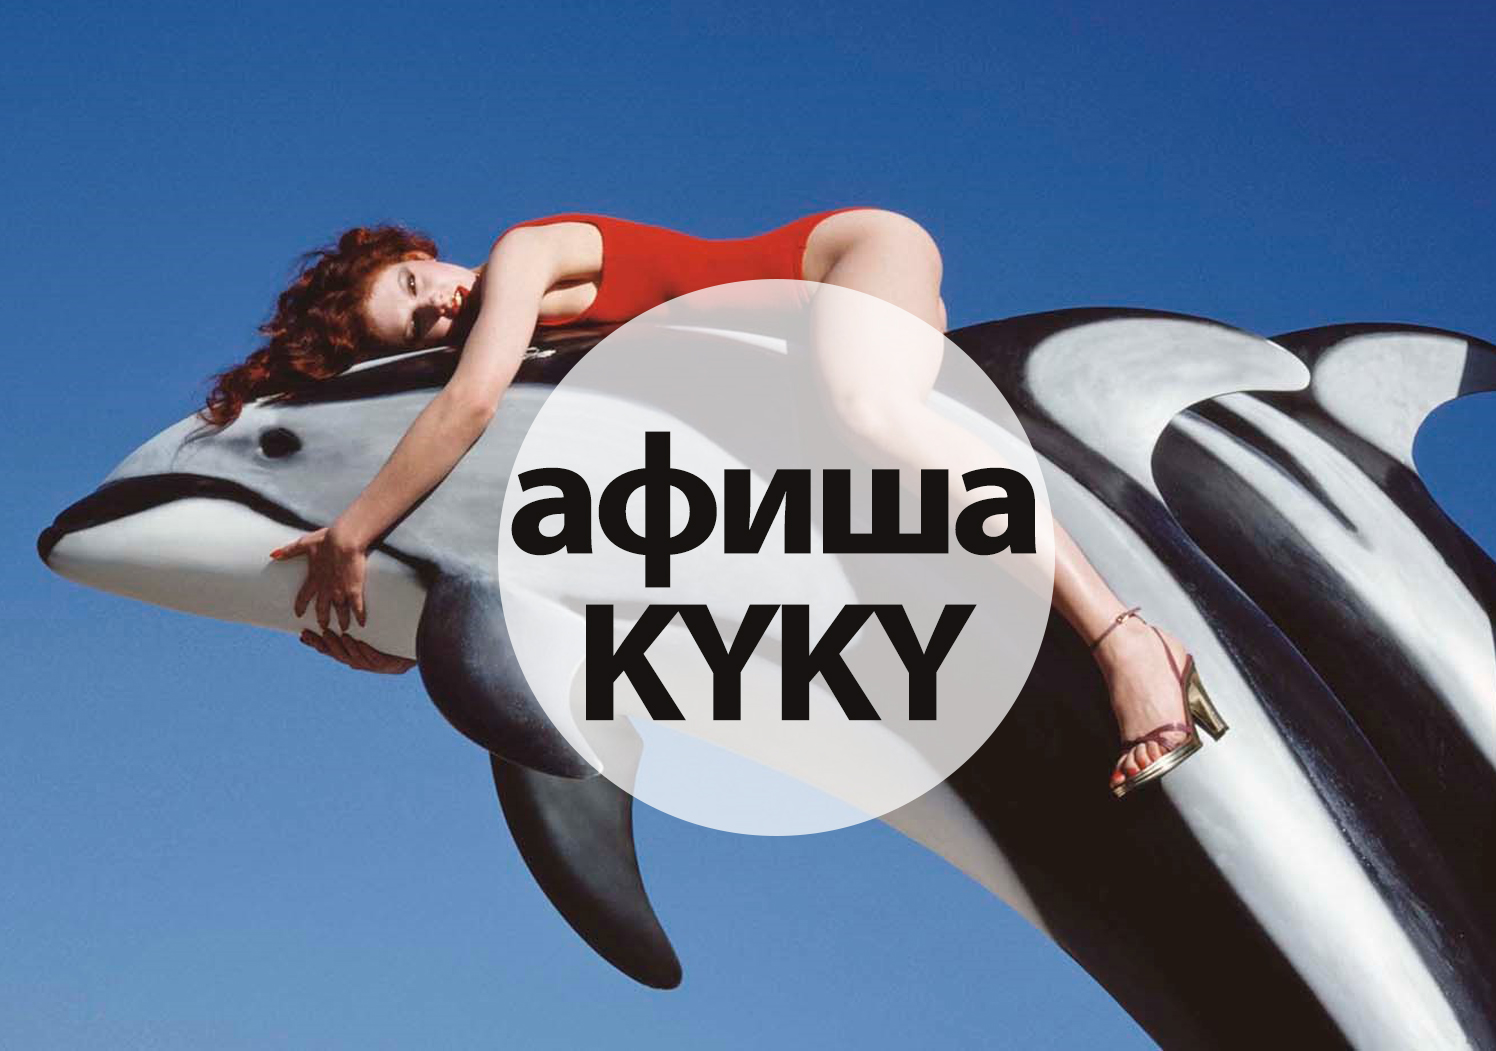 Bloghier ievghienii lipkovich i fotoghraf alieksandr zhdanovich rasskazyvaiut o sobytiiakh etoi niedieli